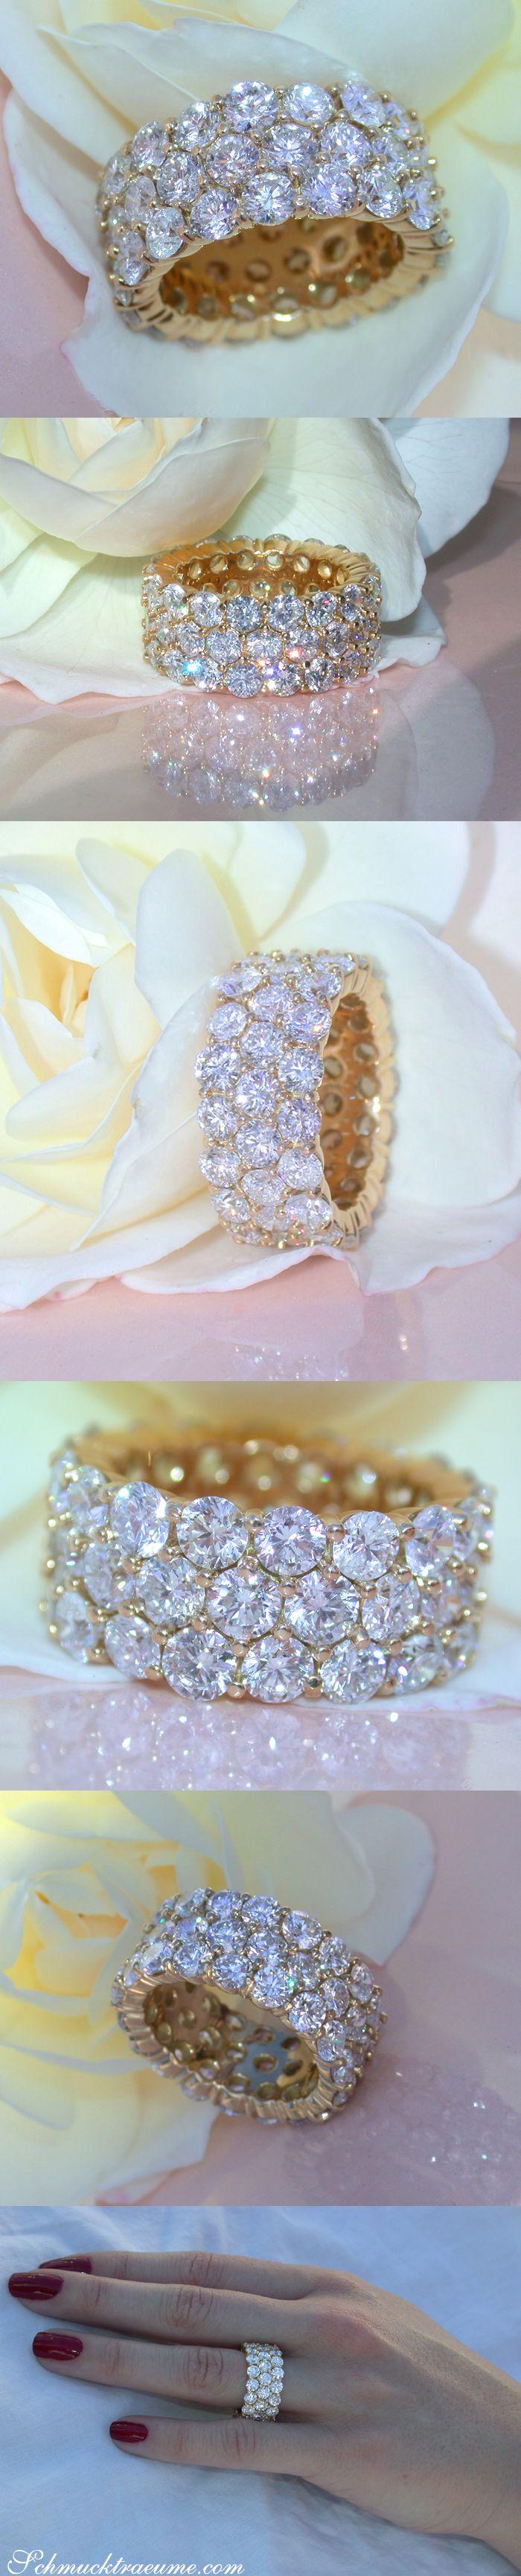 Luxury: Splendid Diamond Eternity Ring - 10.60 ct. G VS - Yellowgold 18k | schmucktraeume.com | Facebook: https://www.facebook.com/Noble-Juwelen-150871984924926/